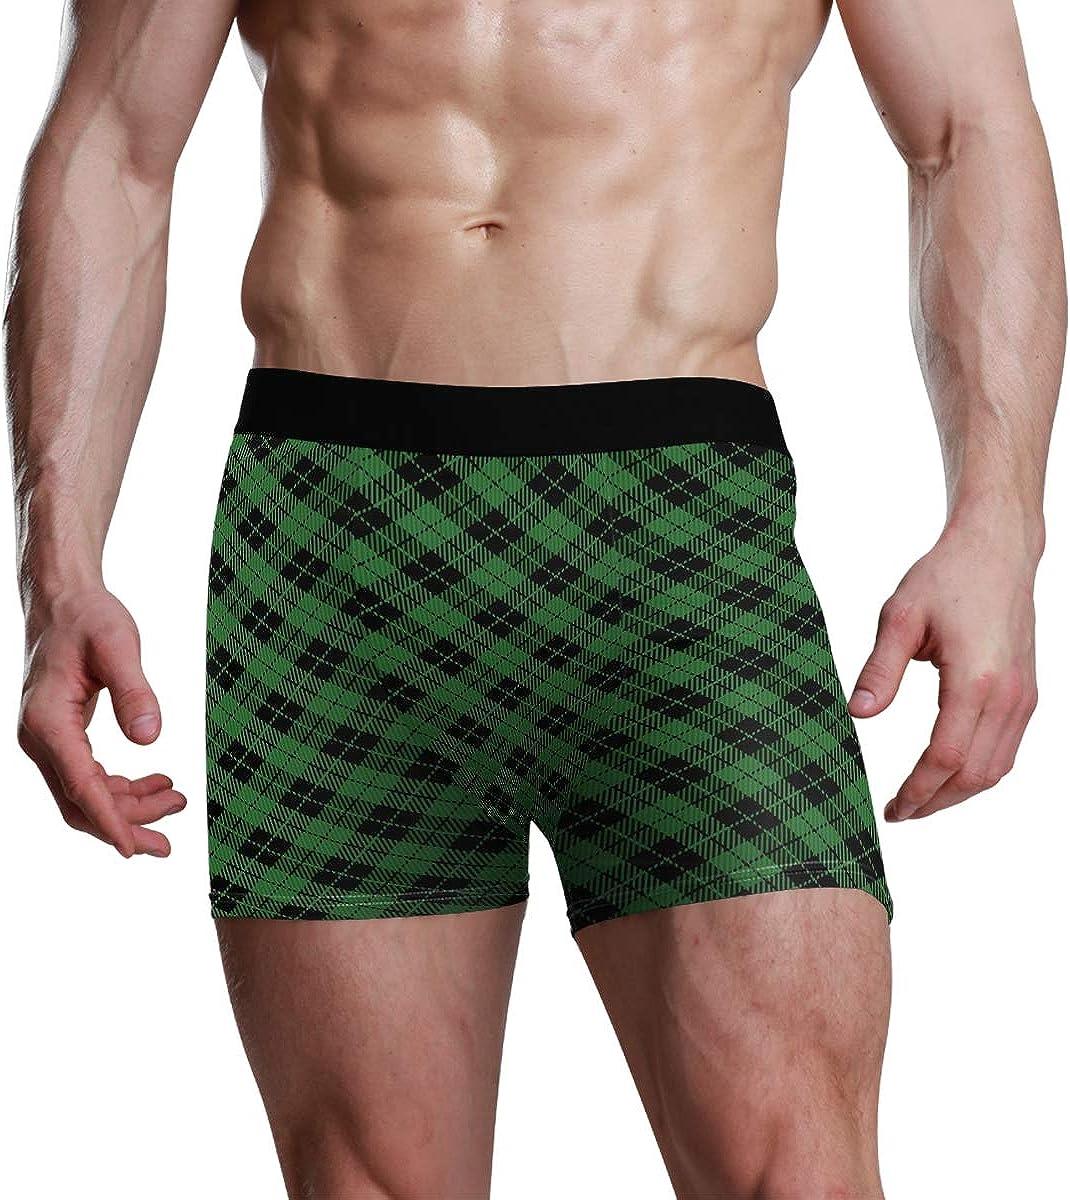 Mens Underwear Briefs New Year's Plaid Breathable Long Boxer Briefs Underwear Boys